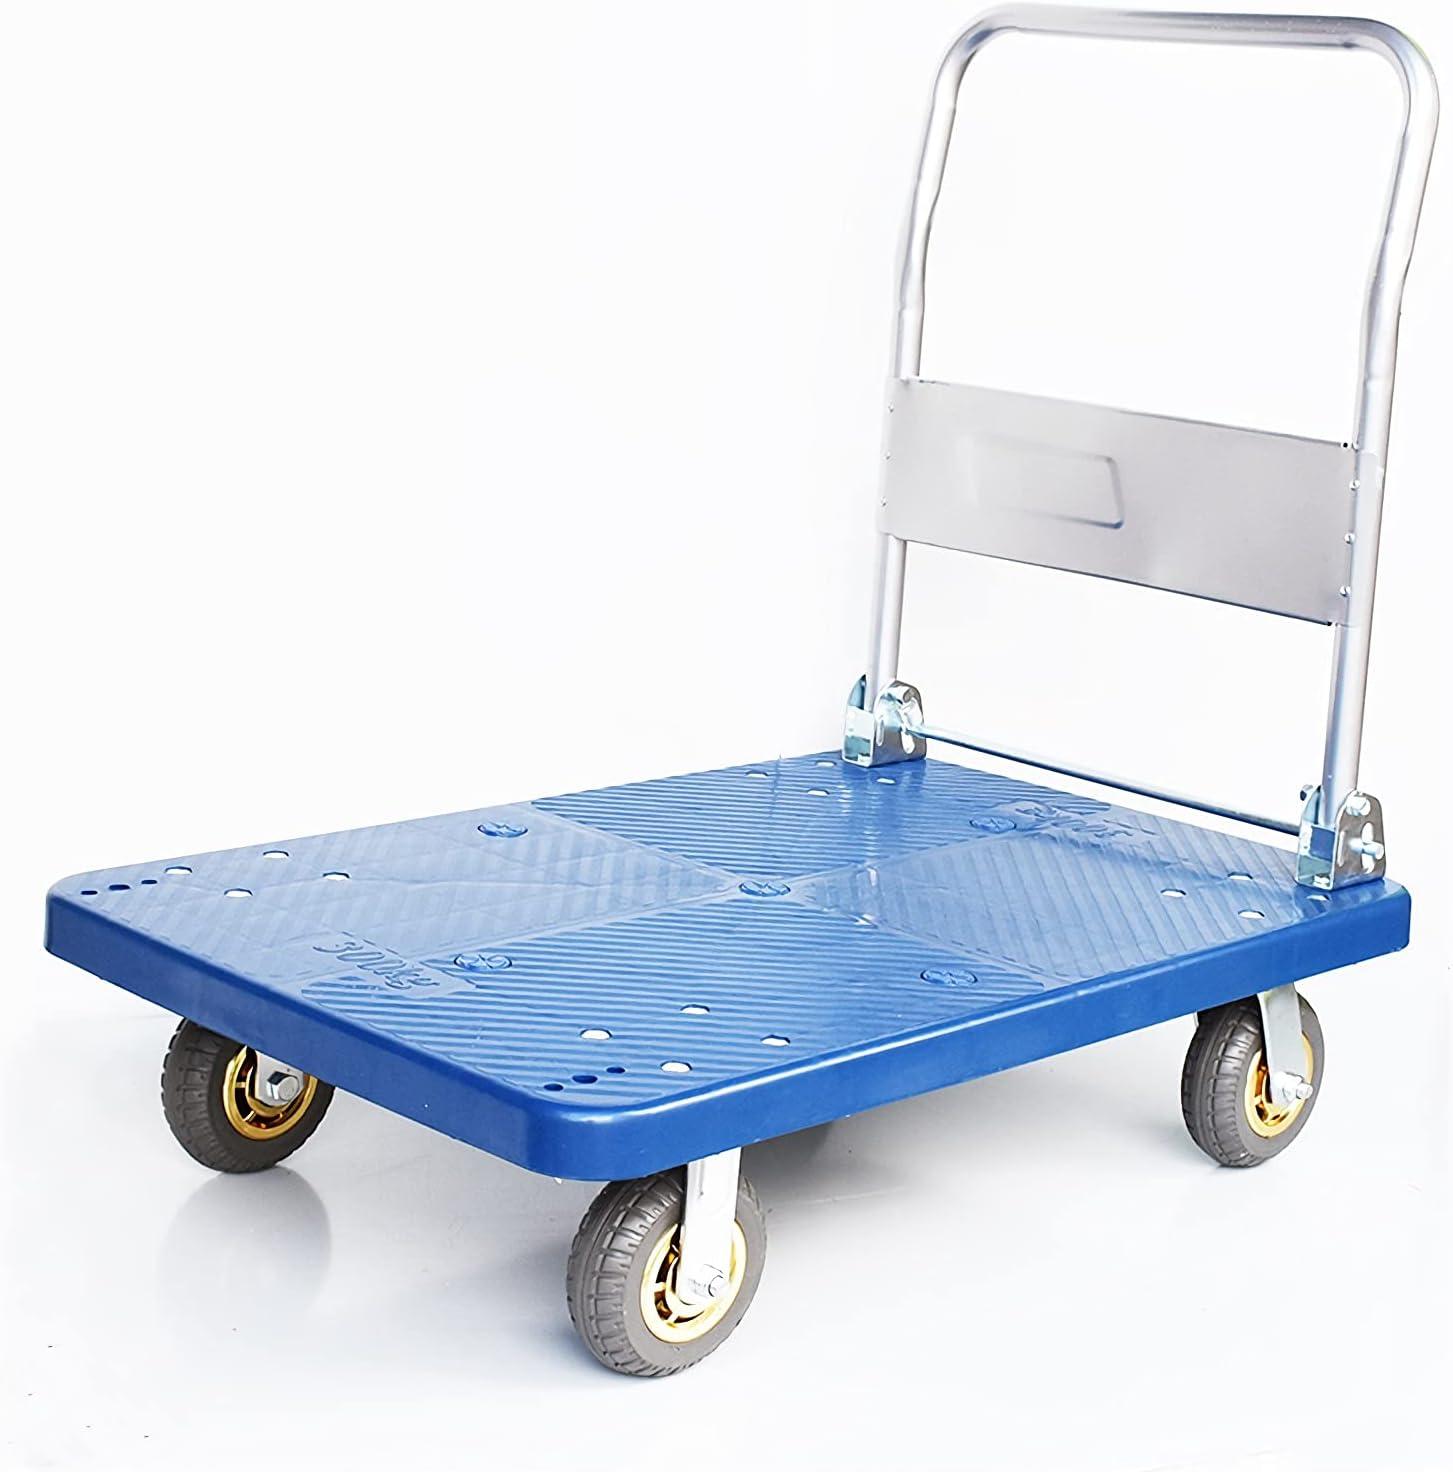 DALIZHAI777 Platform Cart 4 5 ☆ popular Ranking TOP4 Wheels with Truck Hand